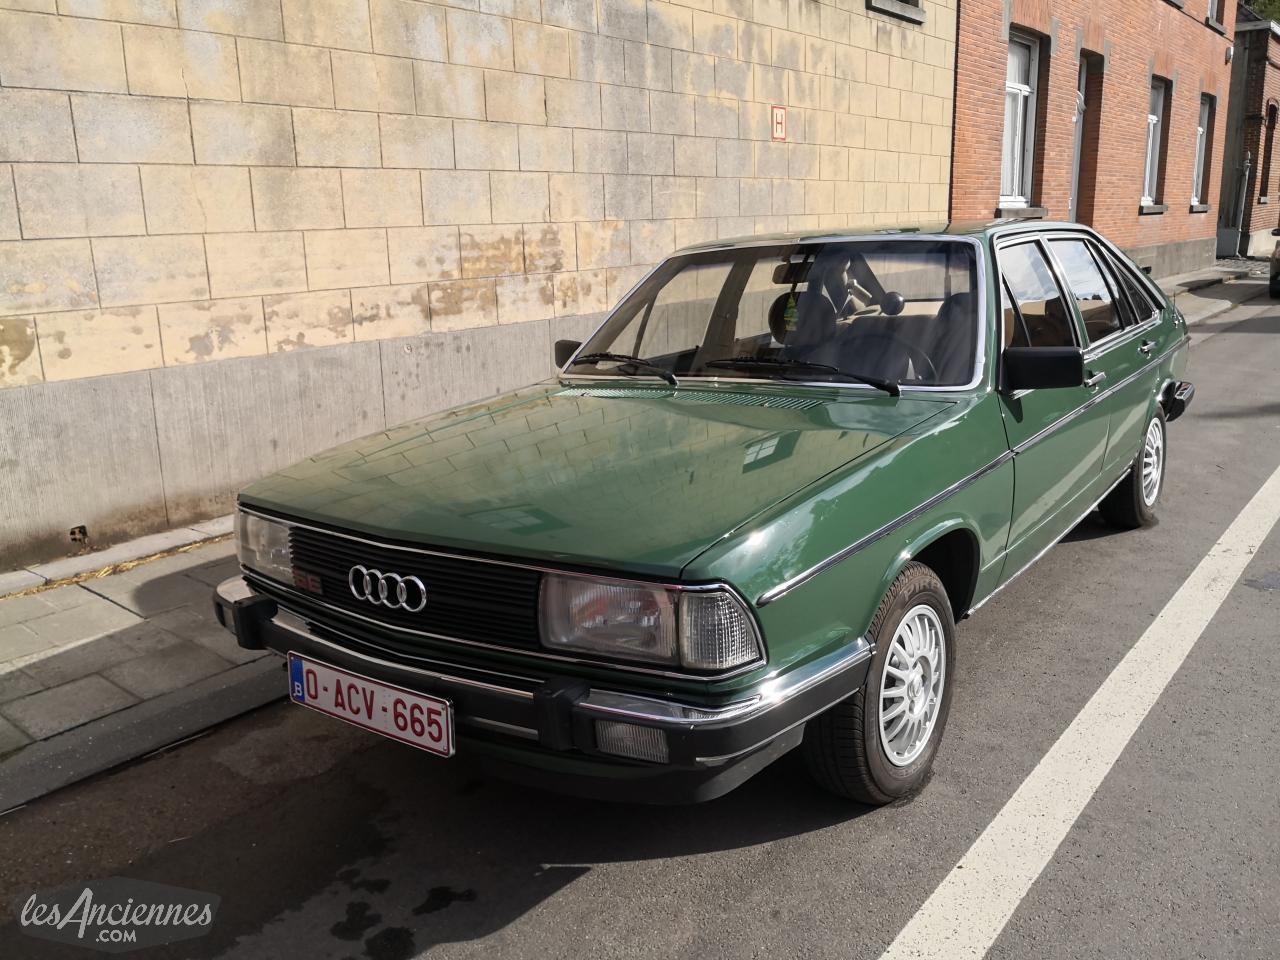 Audi 100 Avant 1981 lesanciennes com  f74b998e97f869cbdacaaccee690c1c3